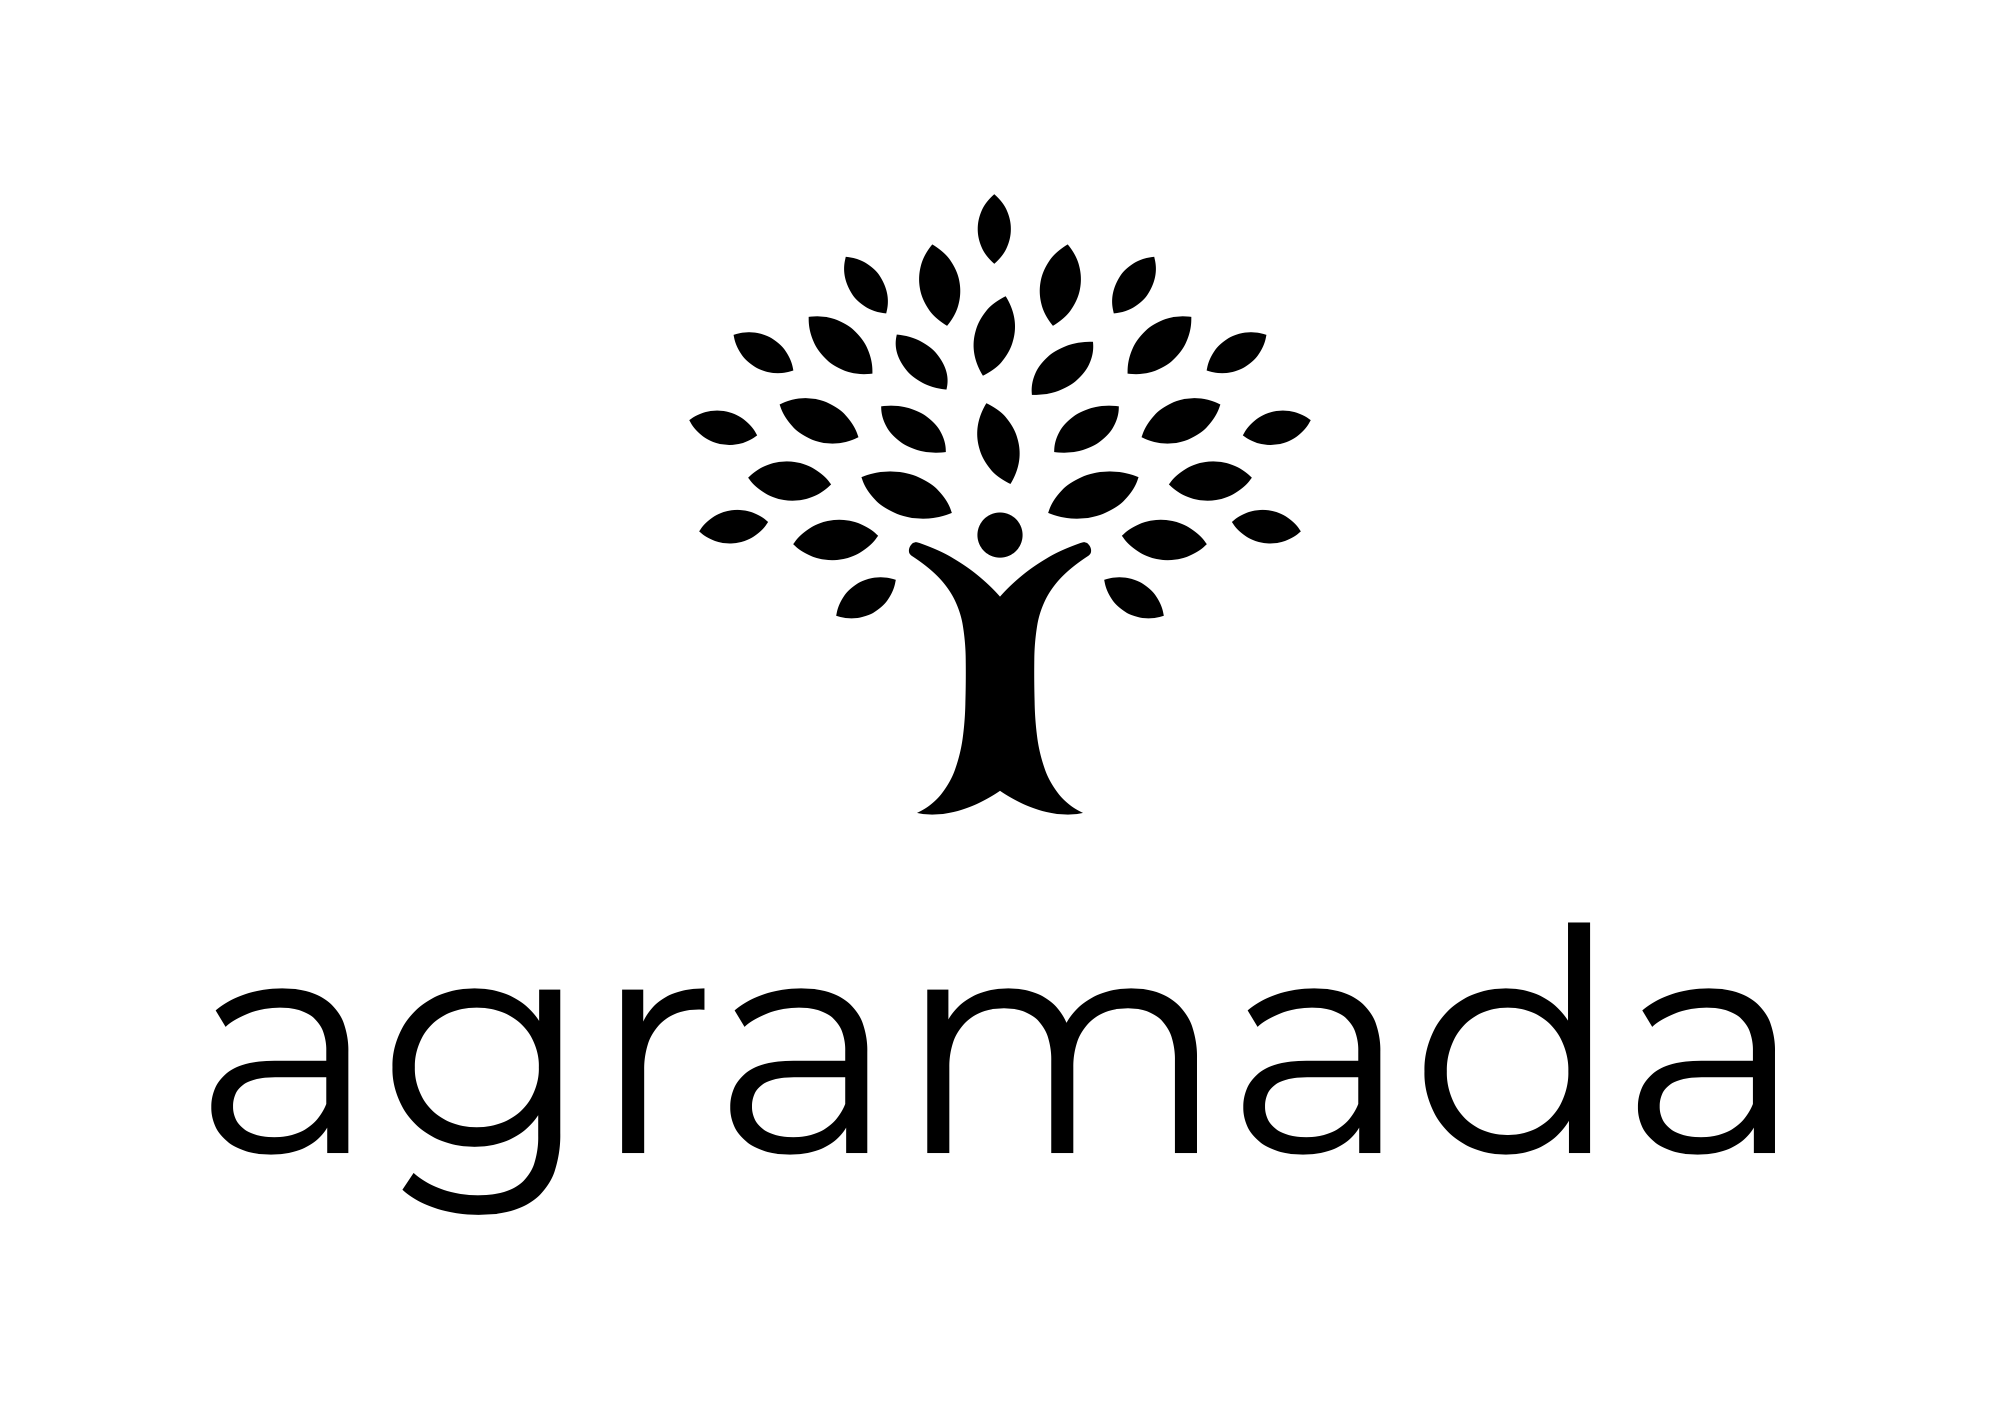 Logo - Full Resolution.png